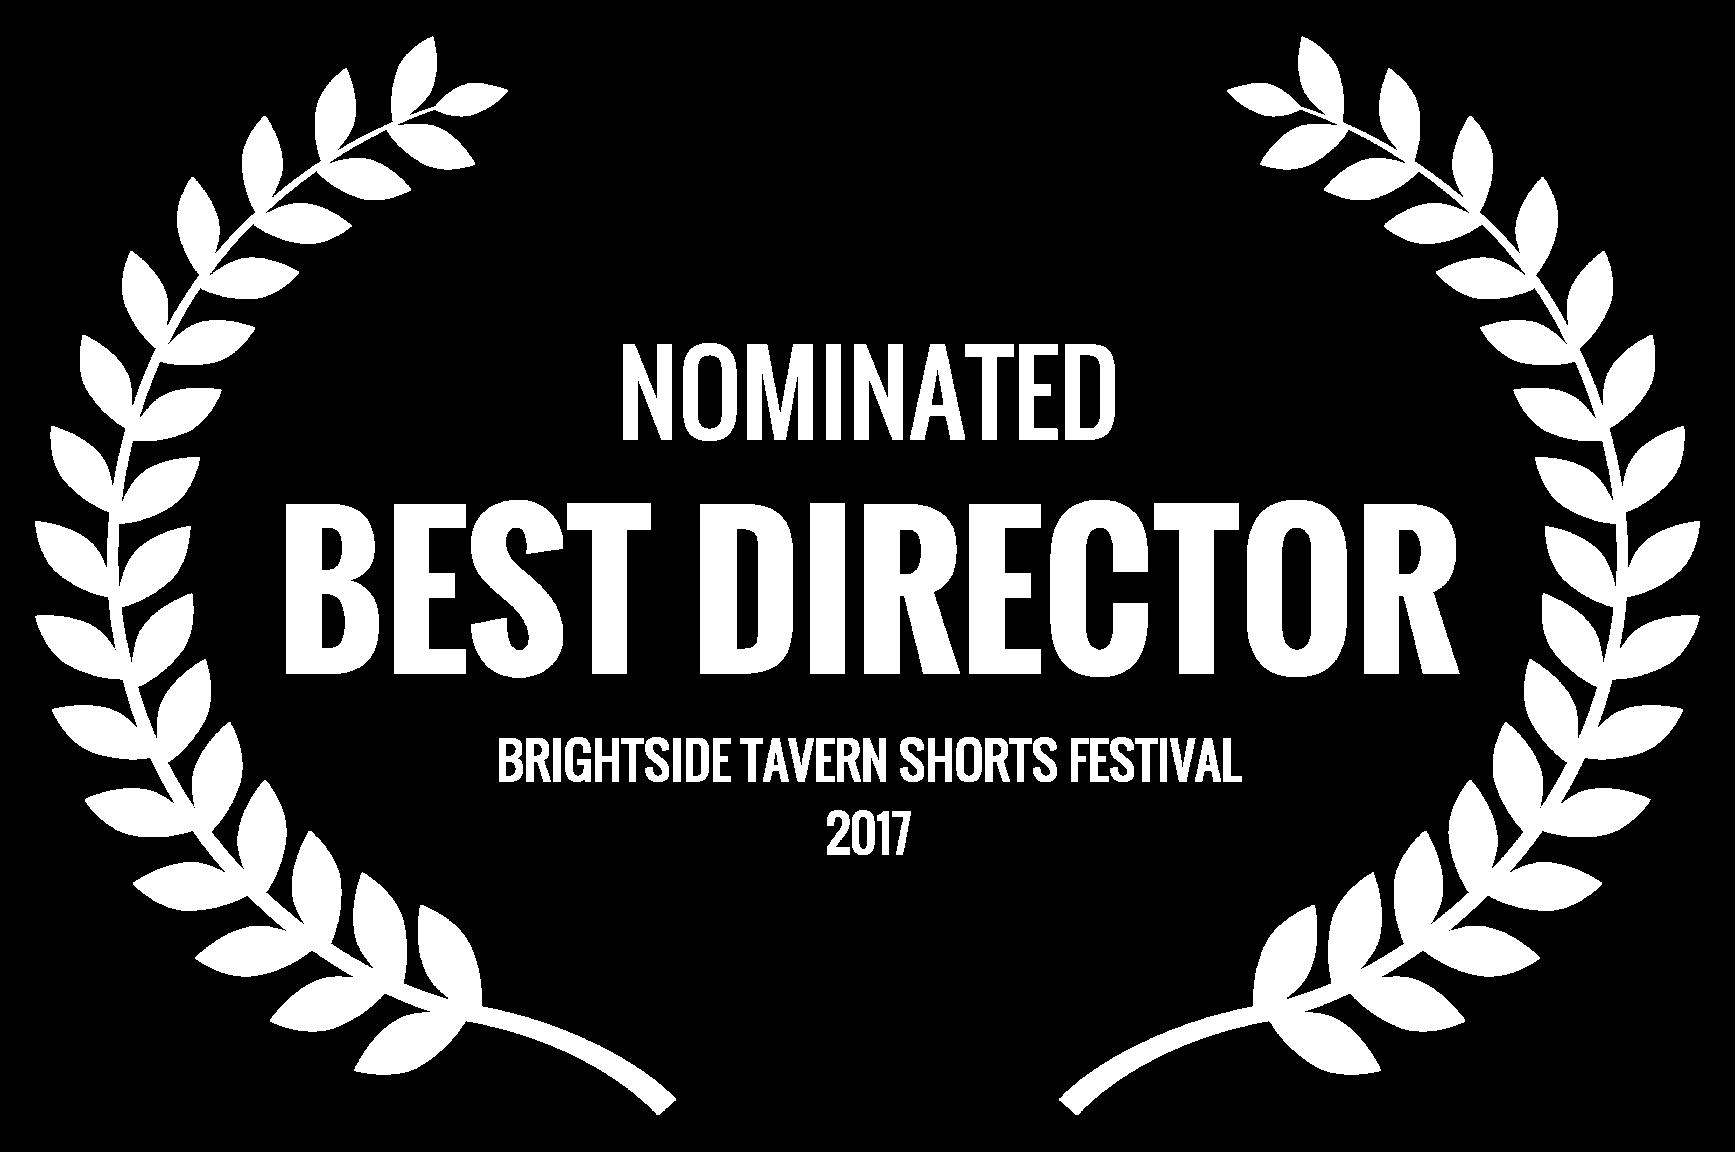 NOMINATED - BEST DIRECTOR - BRIGHTSIDE TAVERN SHORTS FESTIVAL 2017.png